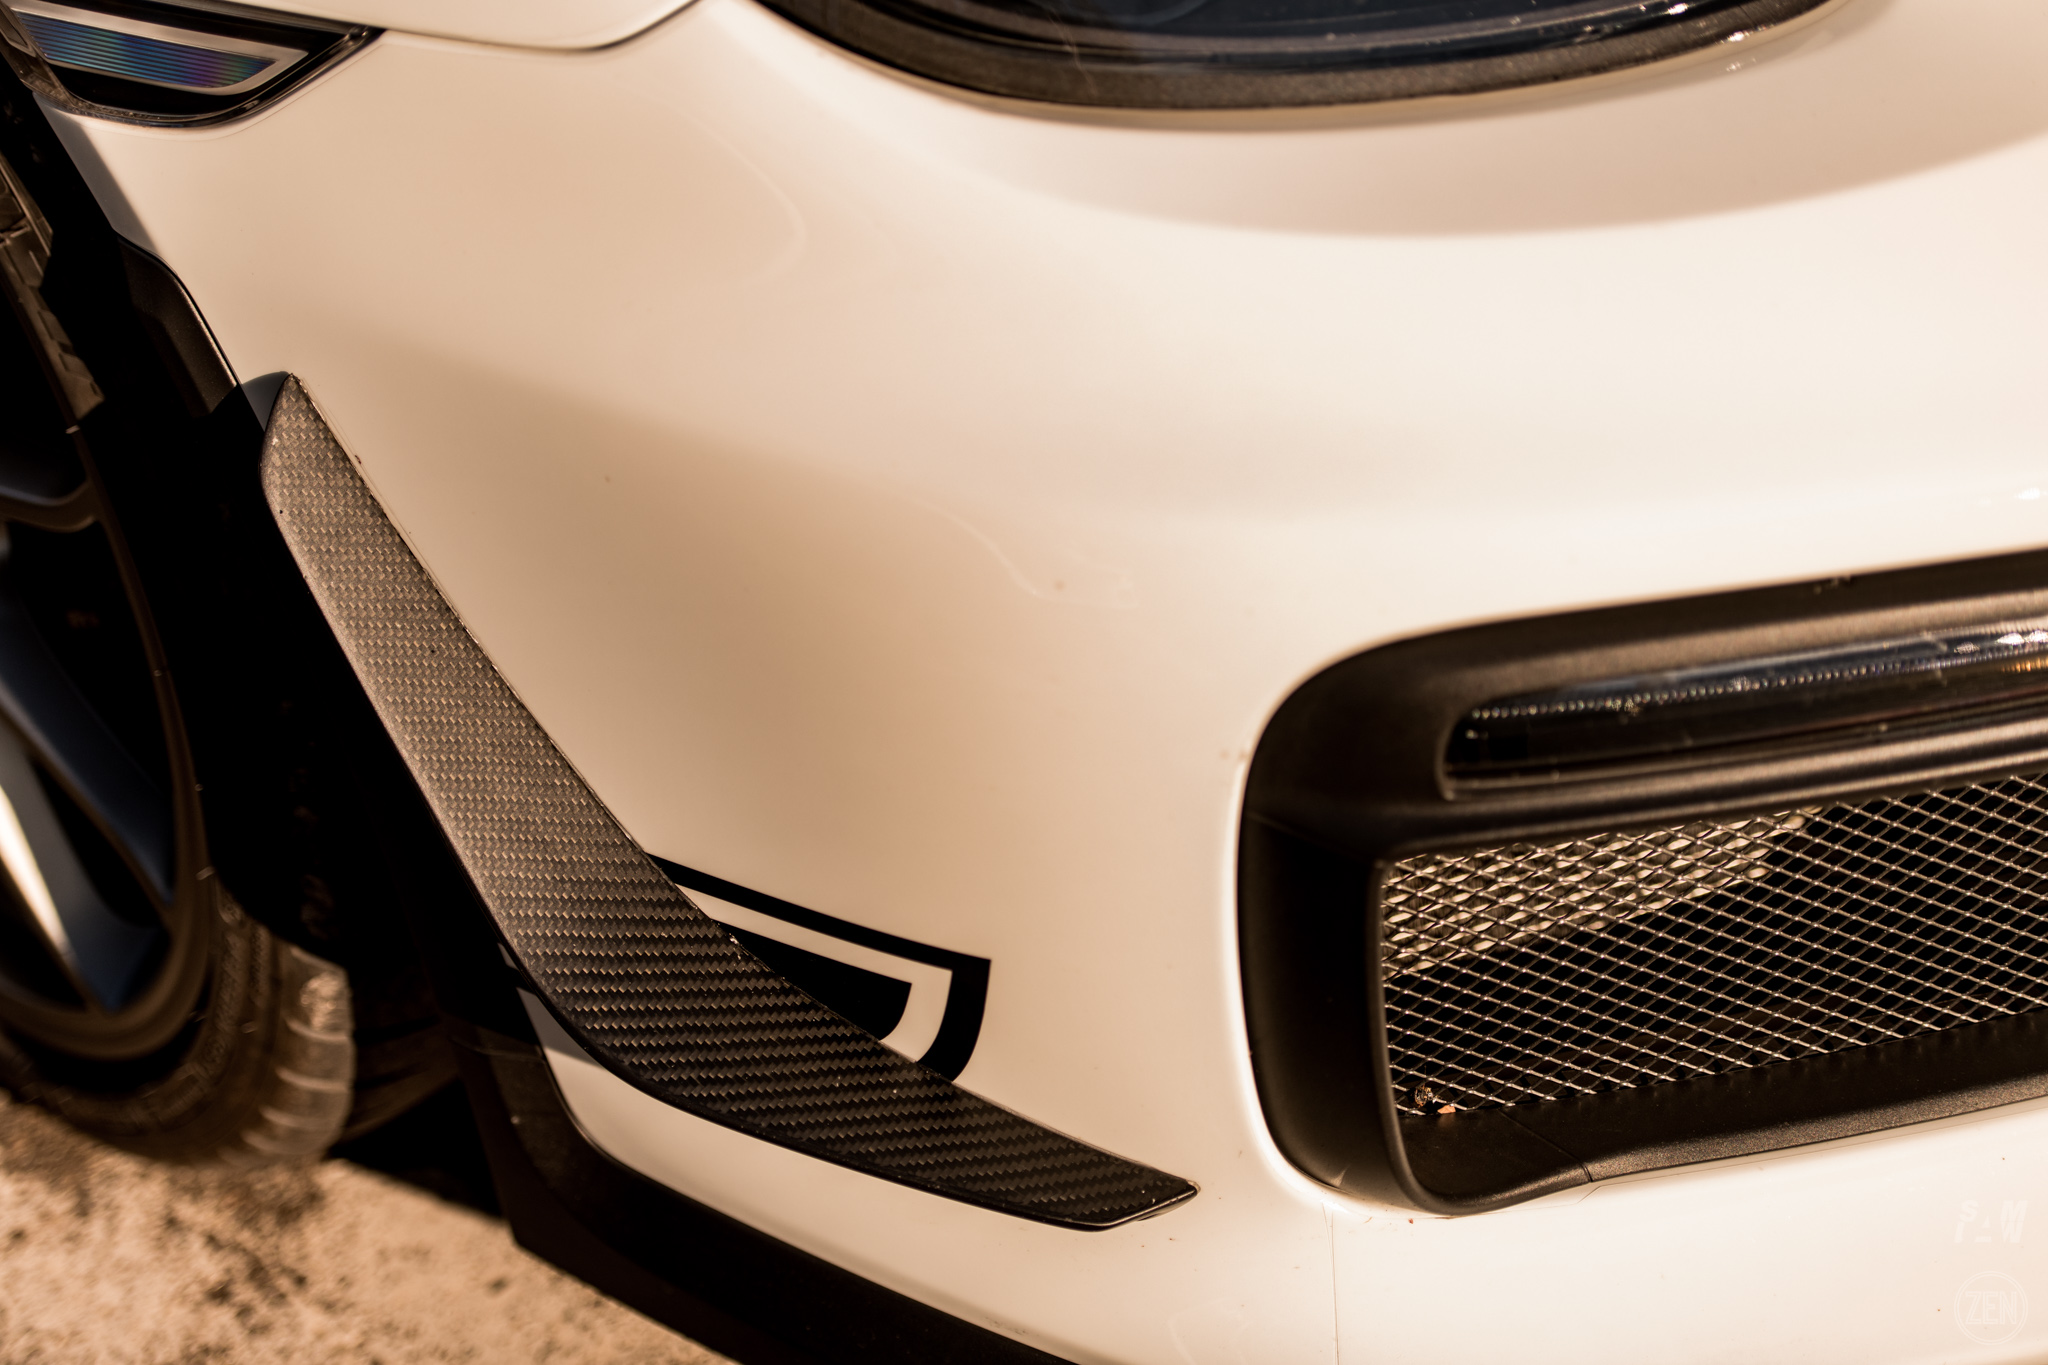 2019-10-27 - Autohaus Porsches & Coffee 076